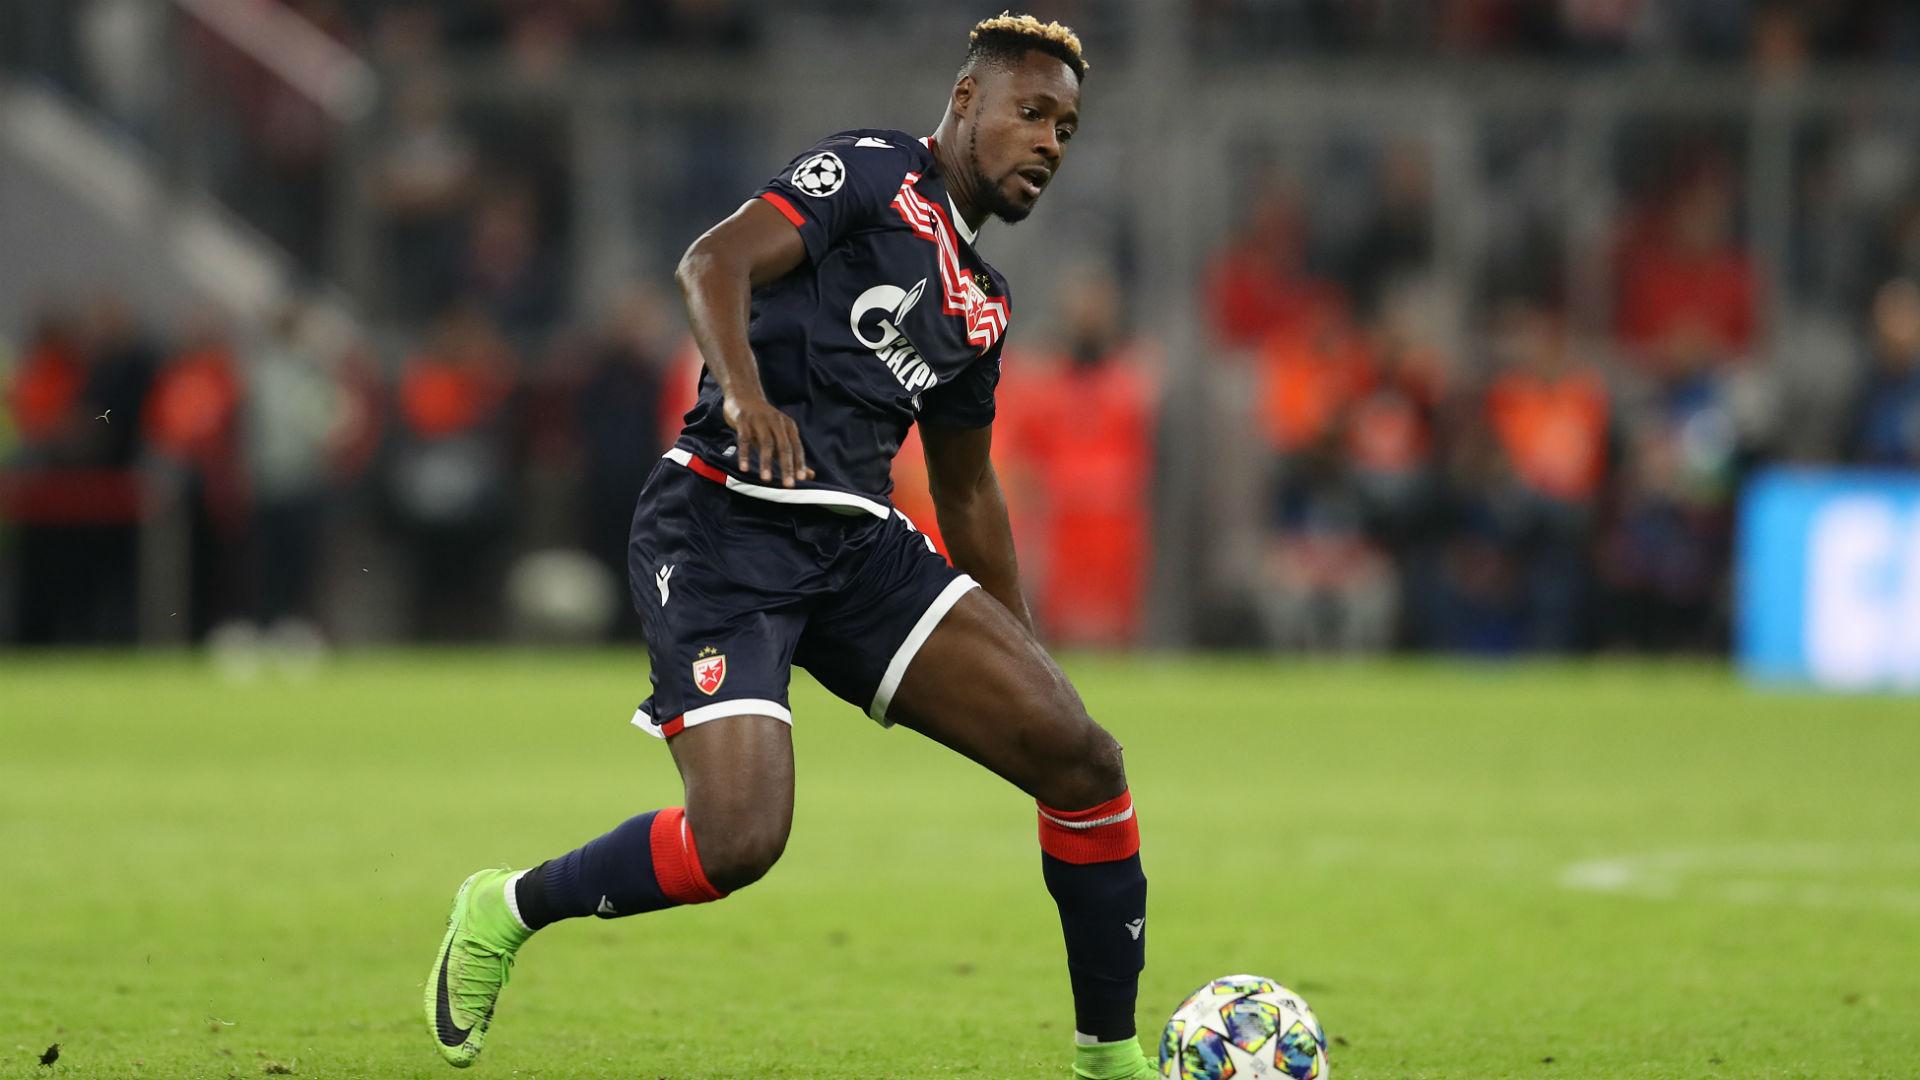 Boakye: Beitar Jerusalem snap up former Juventus striker